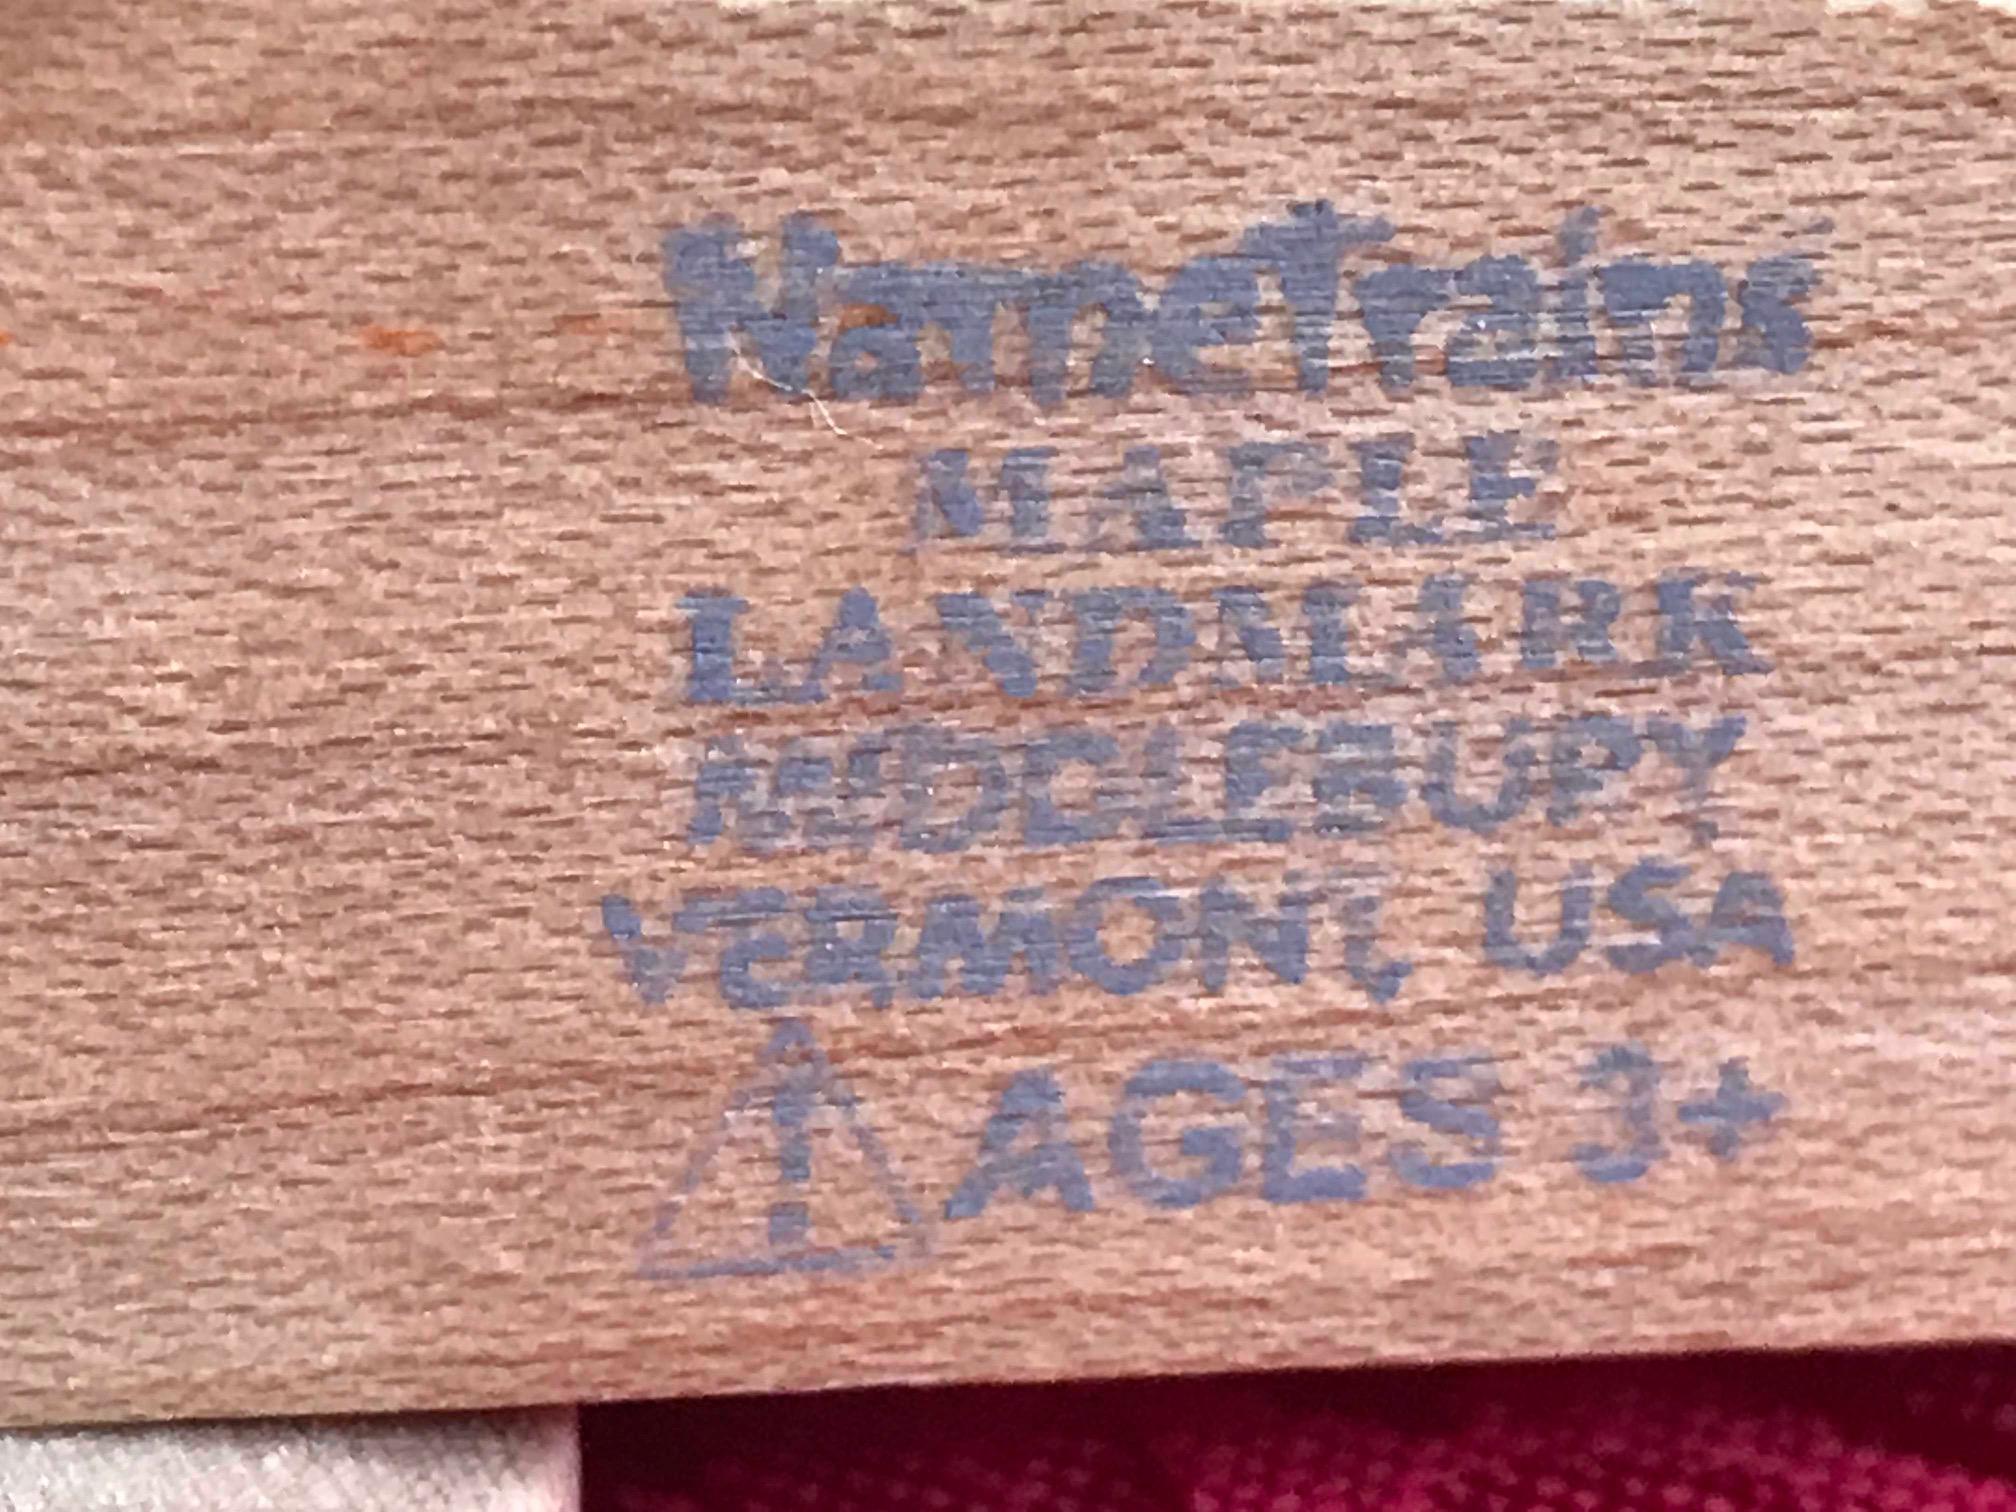 Maple Landmark Wooden Magnetic Train: Lead-Free, Cadmium-Free, Arsenic-Free, Mercury-Free! #SaferChoice